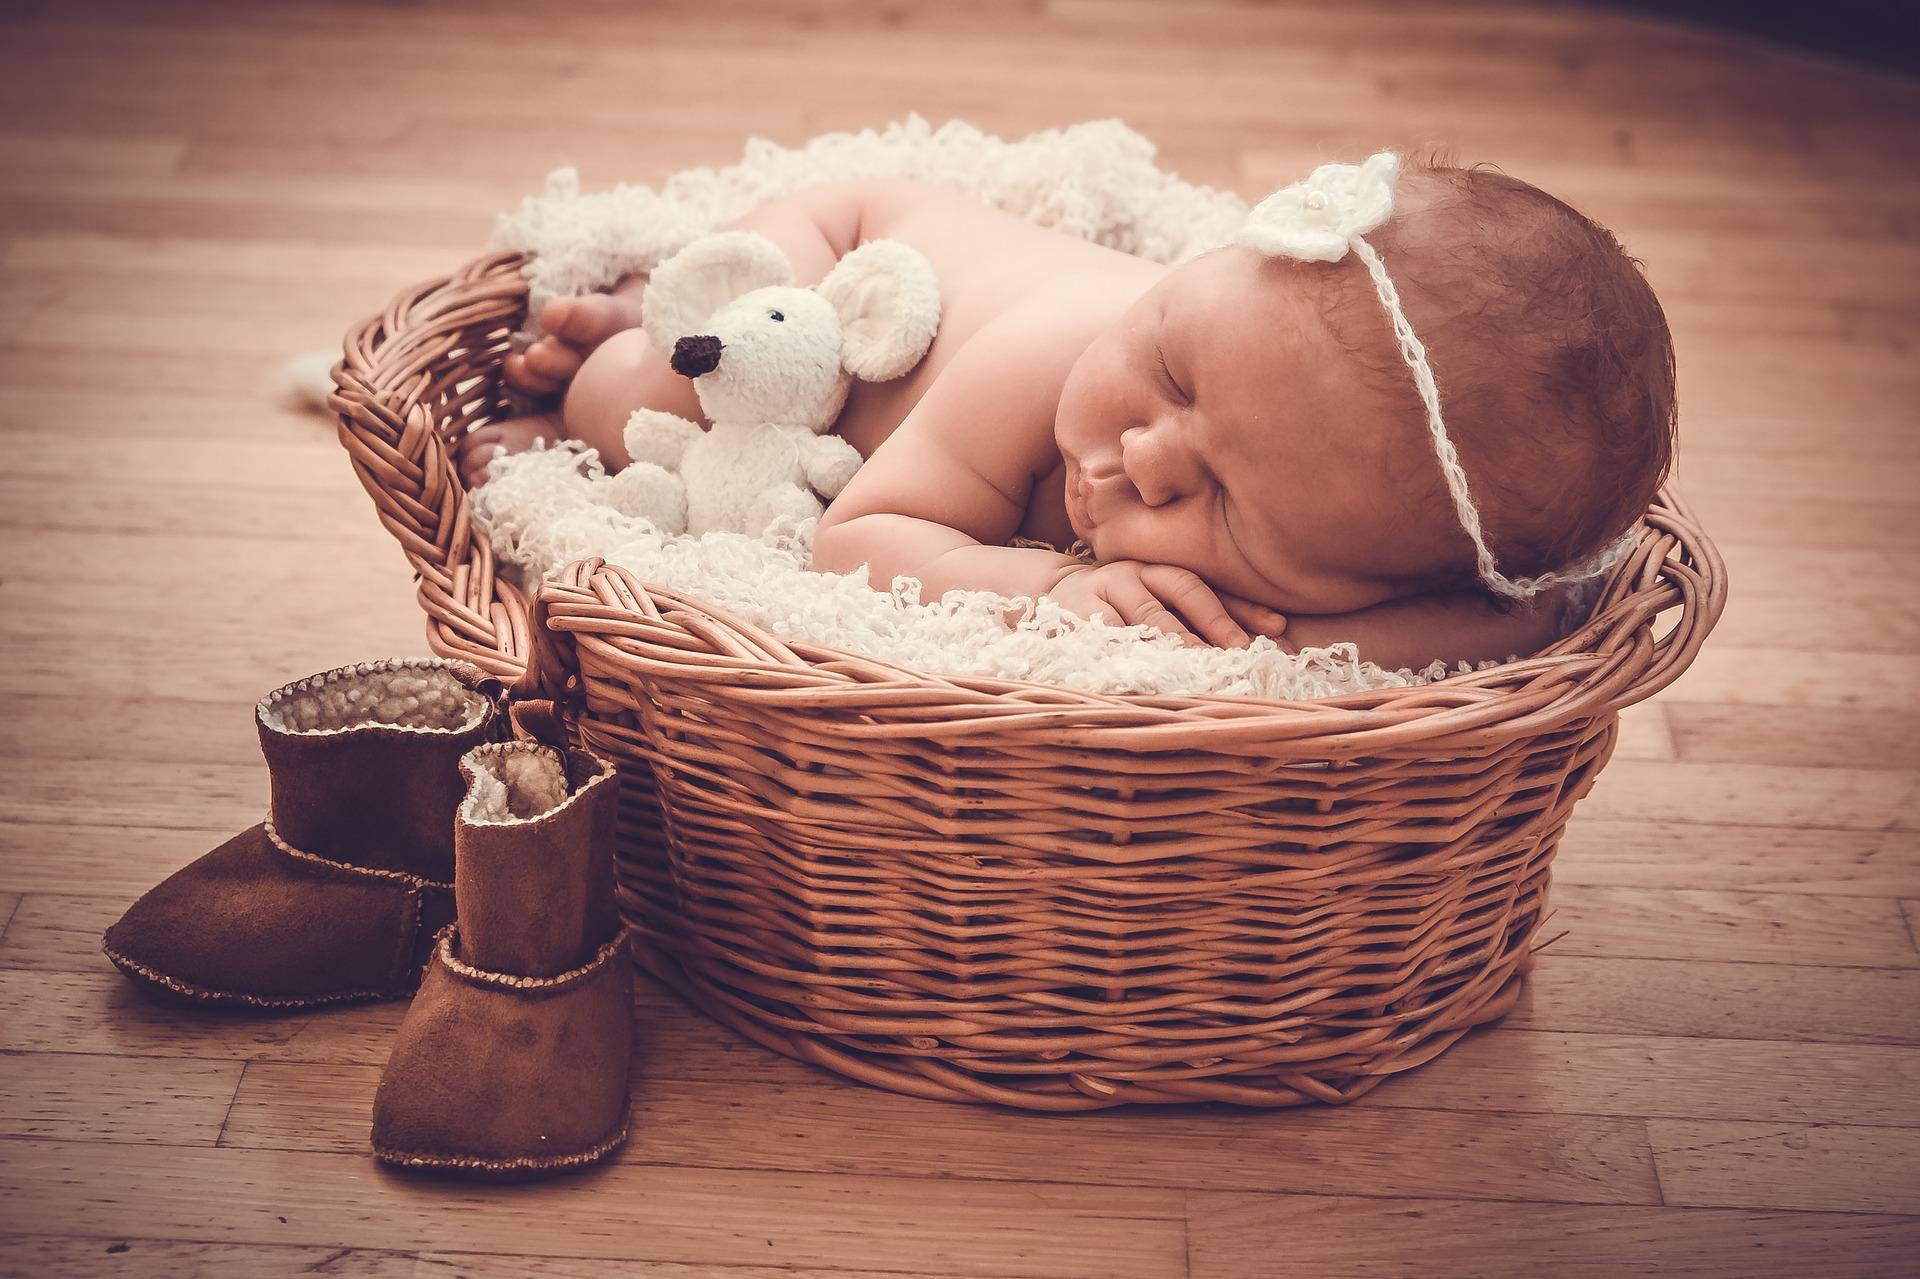 Baby Sleep Music, Relaxing Mozart Lullaby | Music2relax com